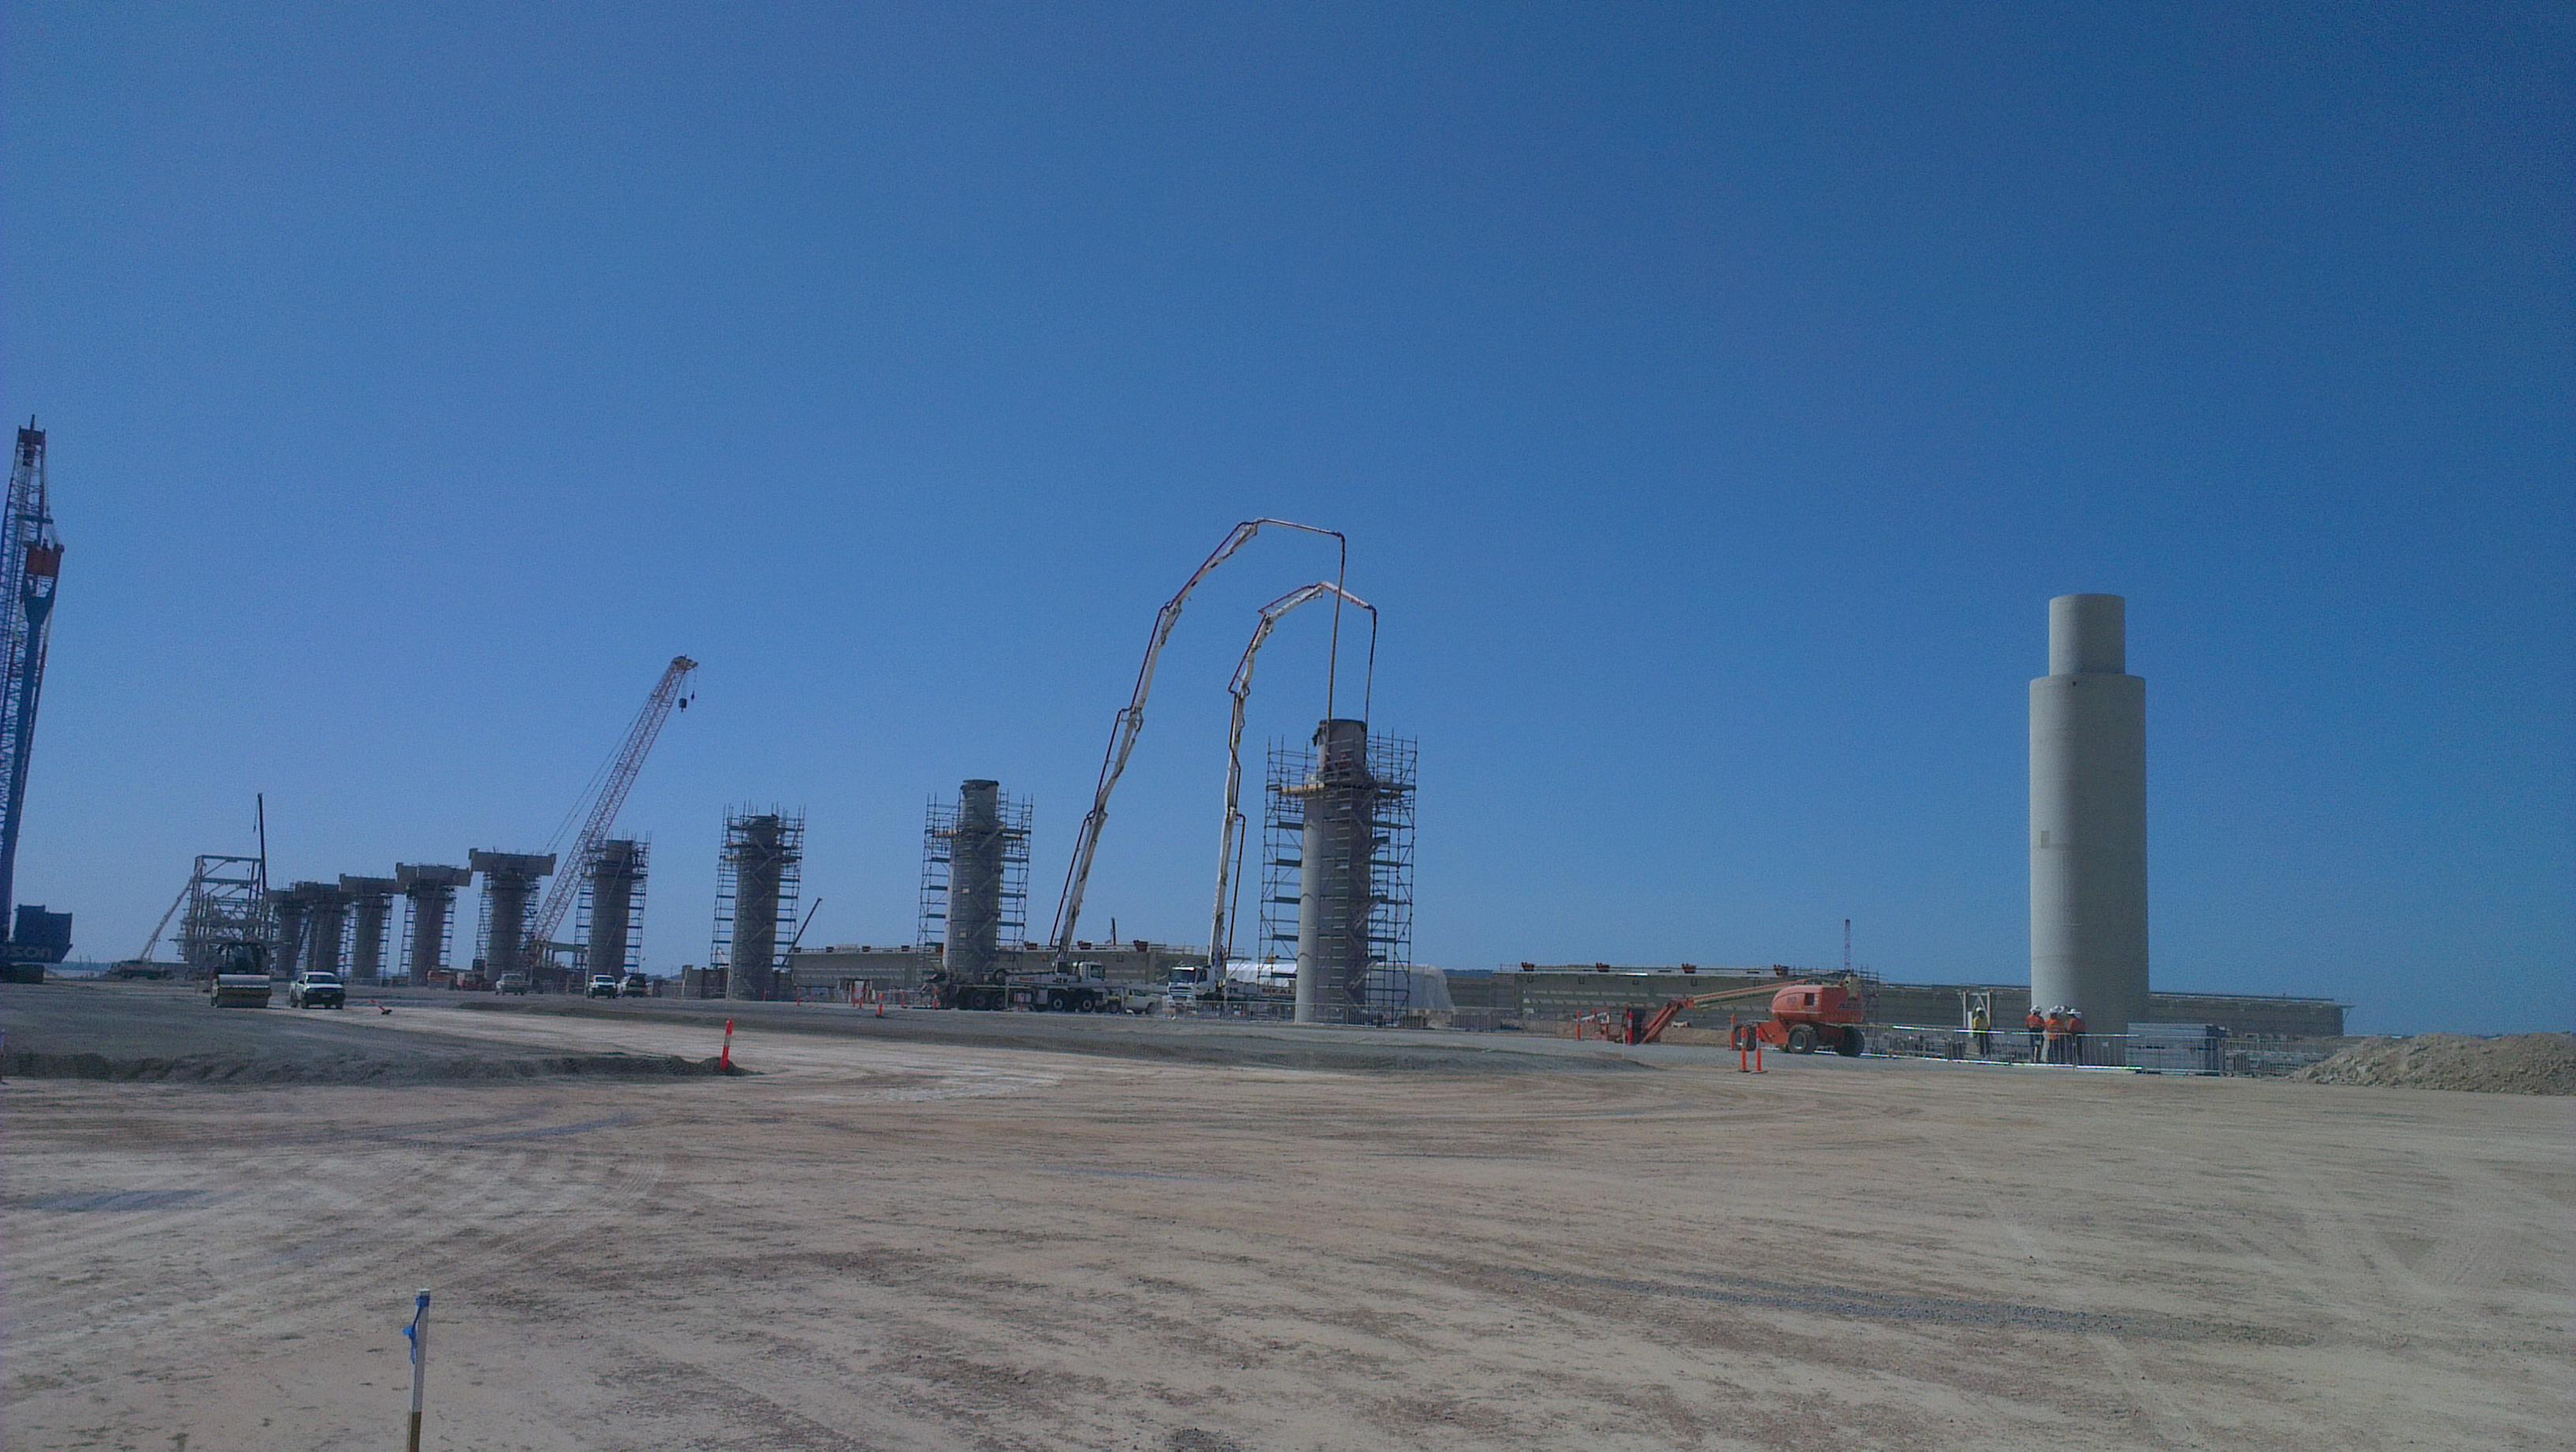 meales-long-distance-concrete-pumping-jhg-wiggins-Island-junjin-42M-48M